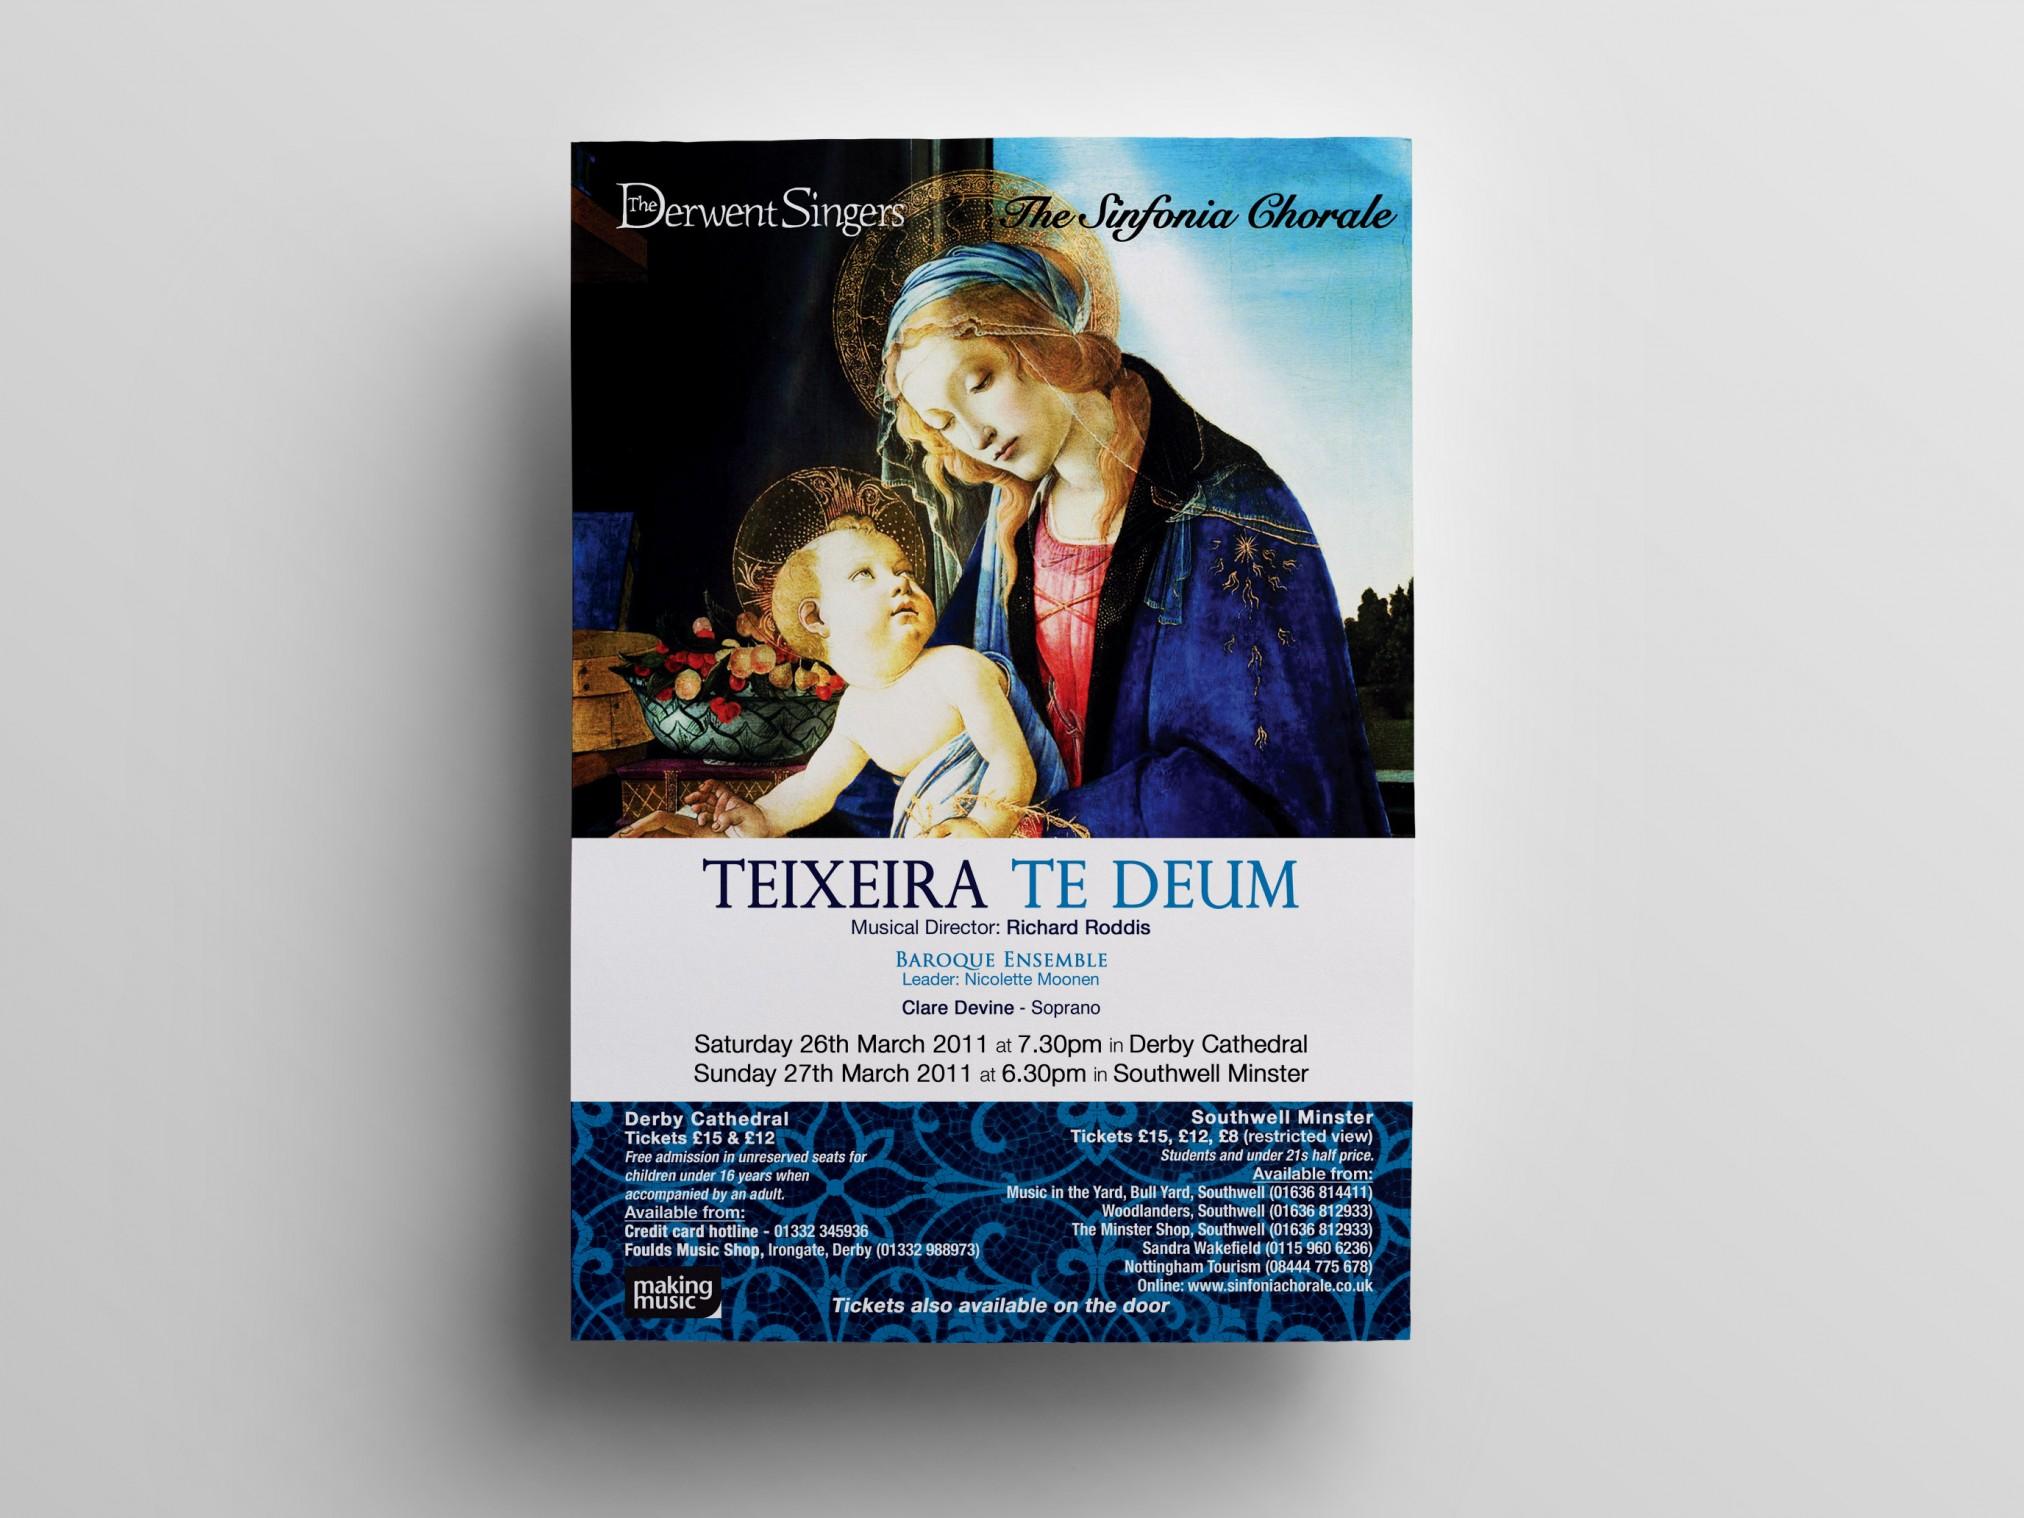 Teixeira Sinfonia